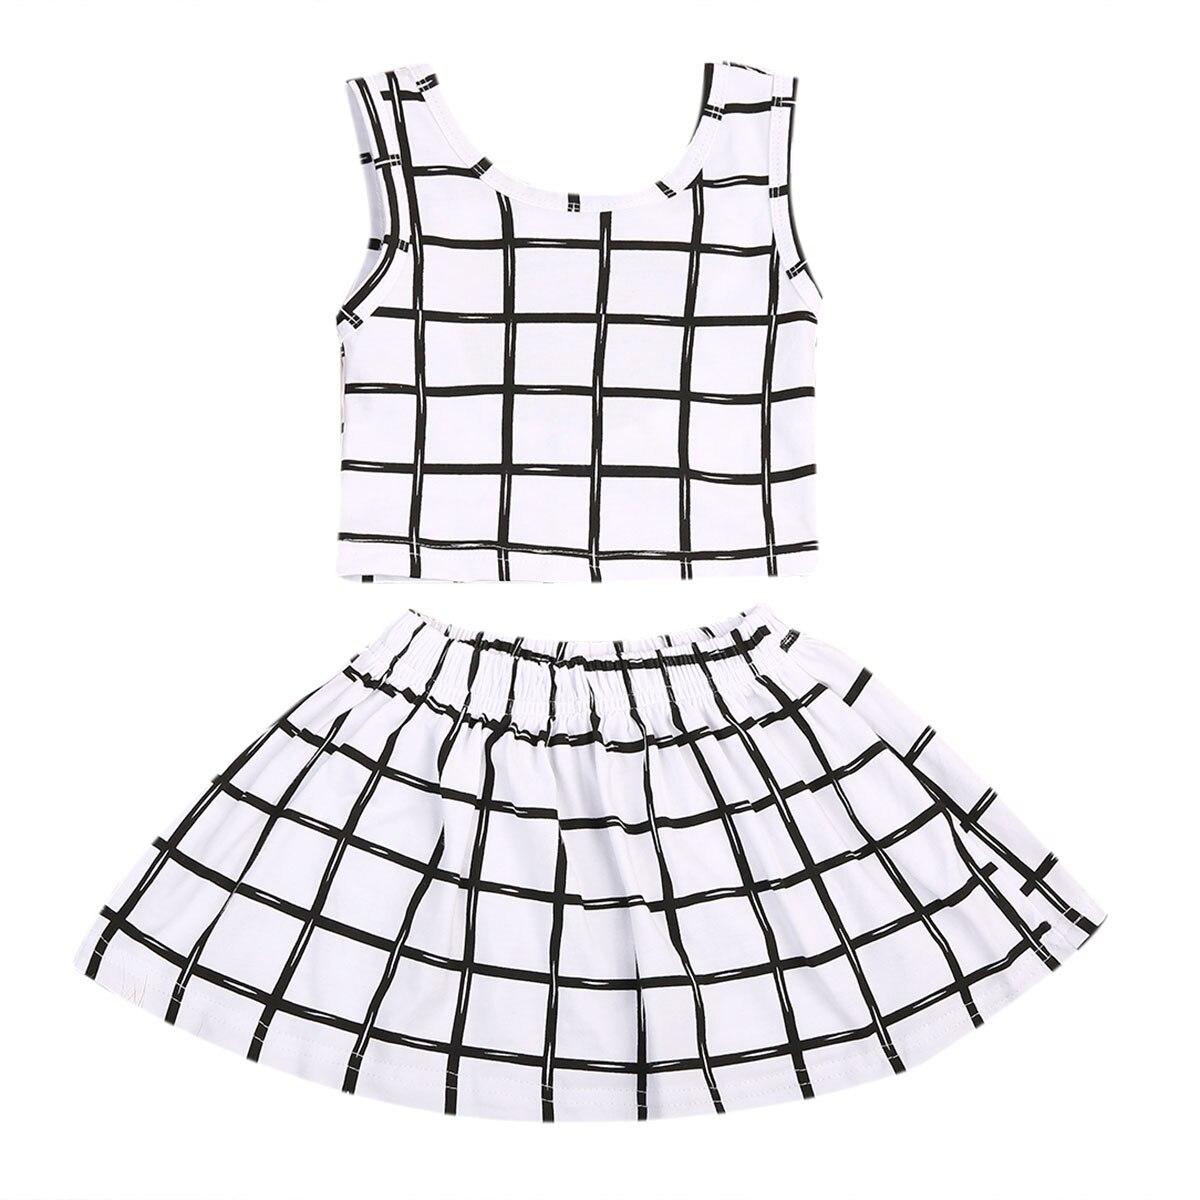 Newborn Baby Girls Clothes Set T-Shirt Tops Shirt + Short Mini Skirt Tutu Dress Plaid Outfits 0-6M 2pcs skirt set 2016 wholesale baby girls cartoon short sleeve tops lace cute tutu skirt for 0 4y baby girl